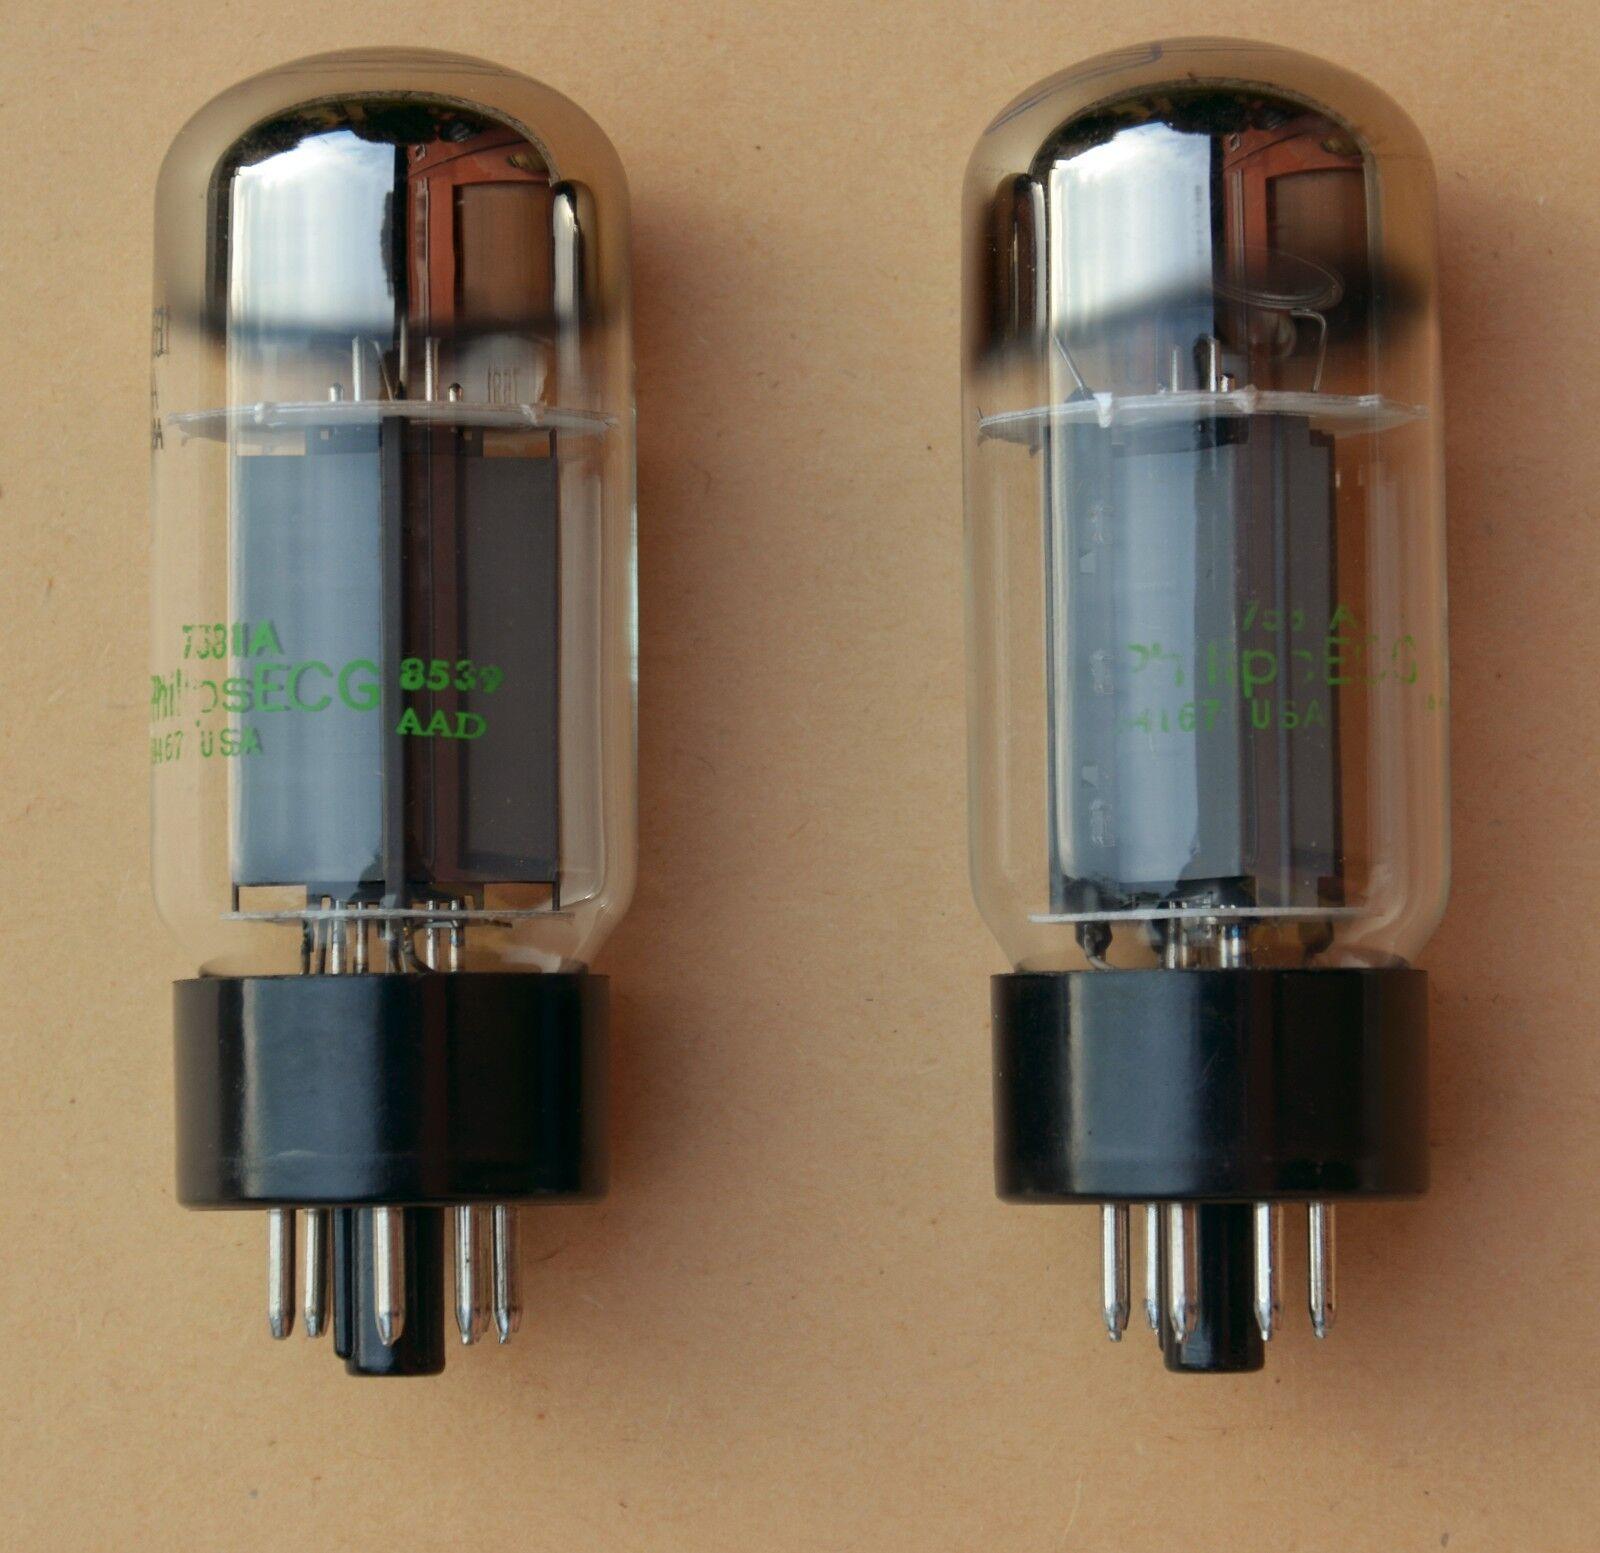 NOS Sylvania 7581A (KT66) 6L6GC marcate Philips ECG coppia selez. - matched pair